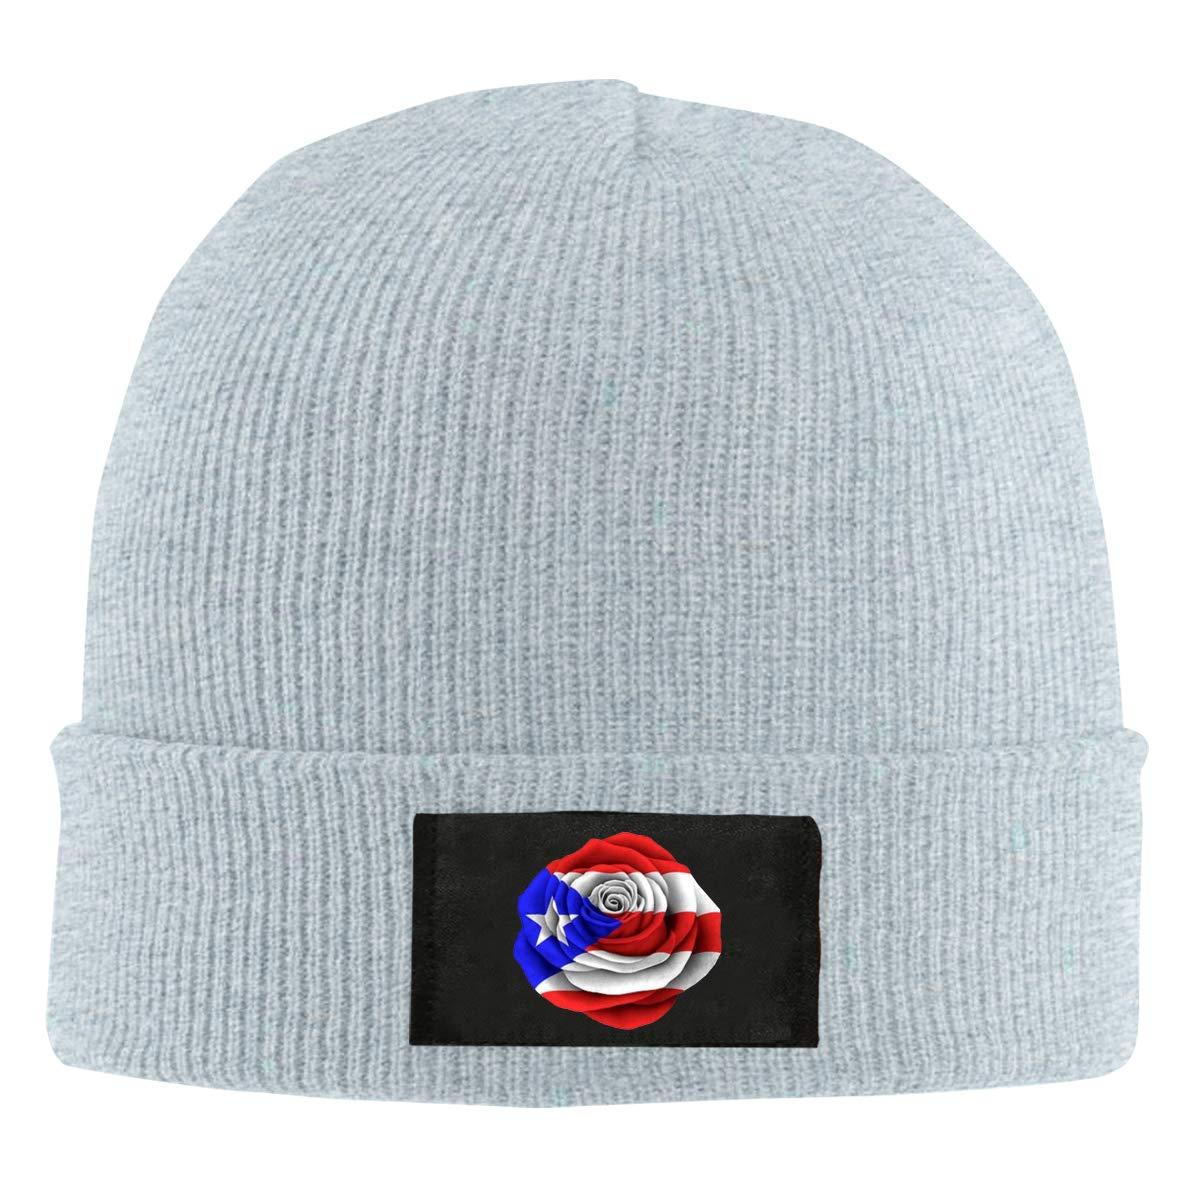 Puerto Rican Rose Flag Unisex Warm Winter Hat Knit Beanie Skull Cap Cuff Beanie Hat Winter Hats